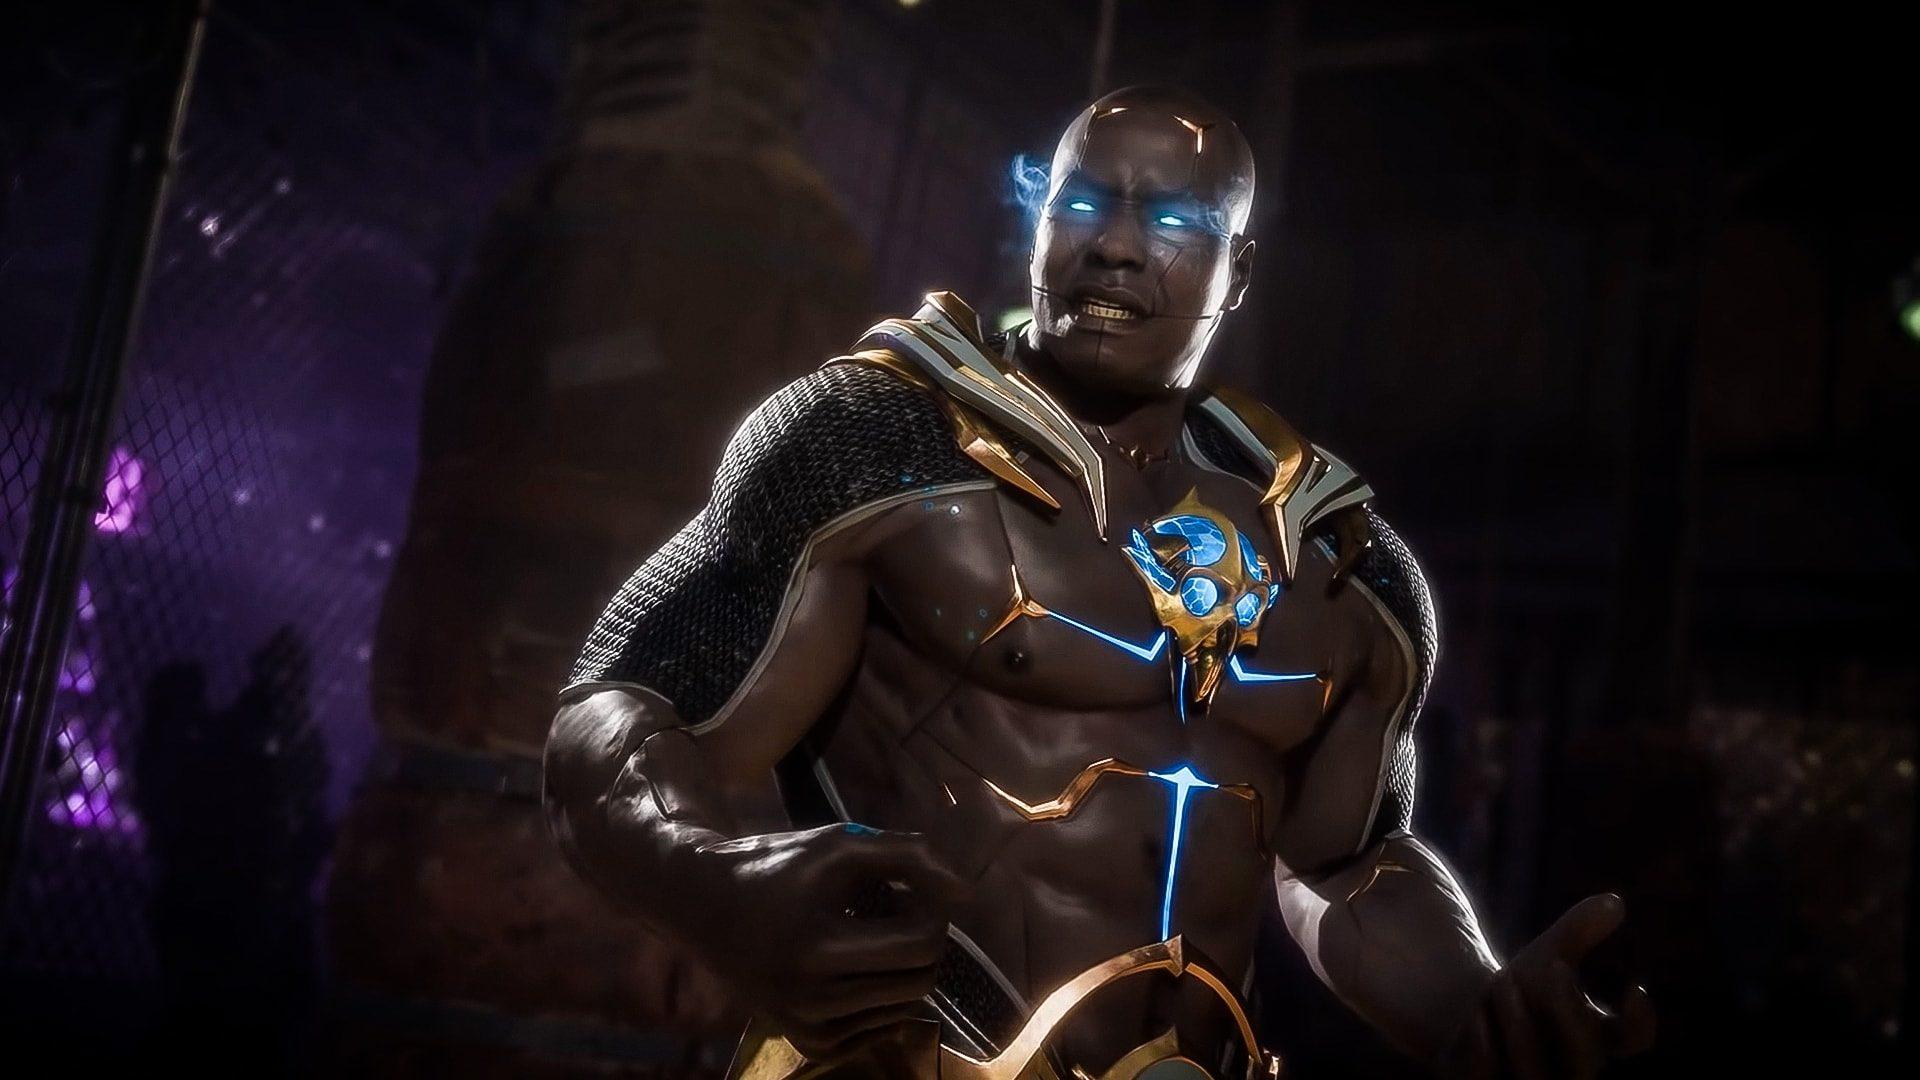 Mortal Kombat 11 PC controls and keybindings | Shacknews